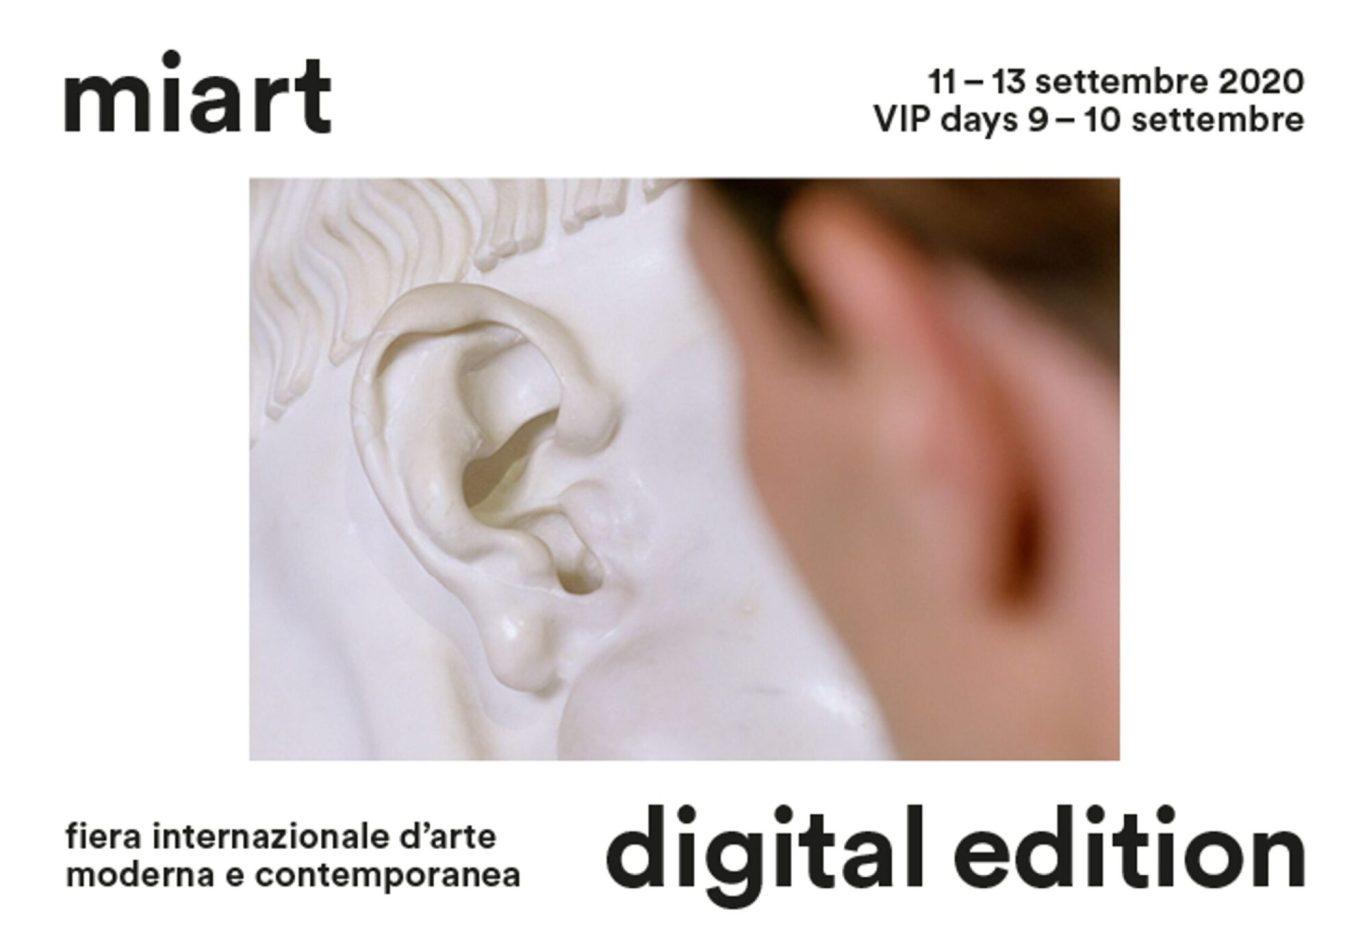 miart digital